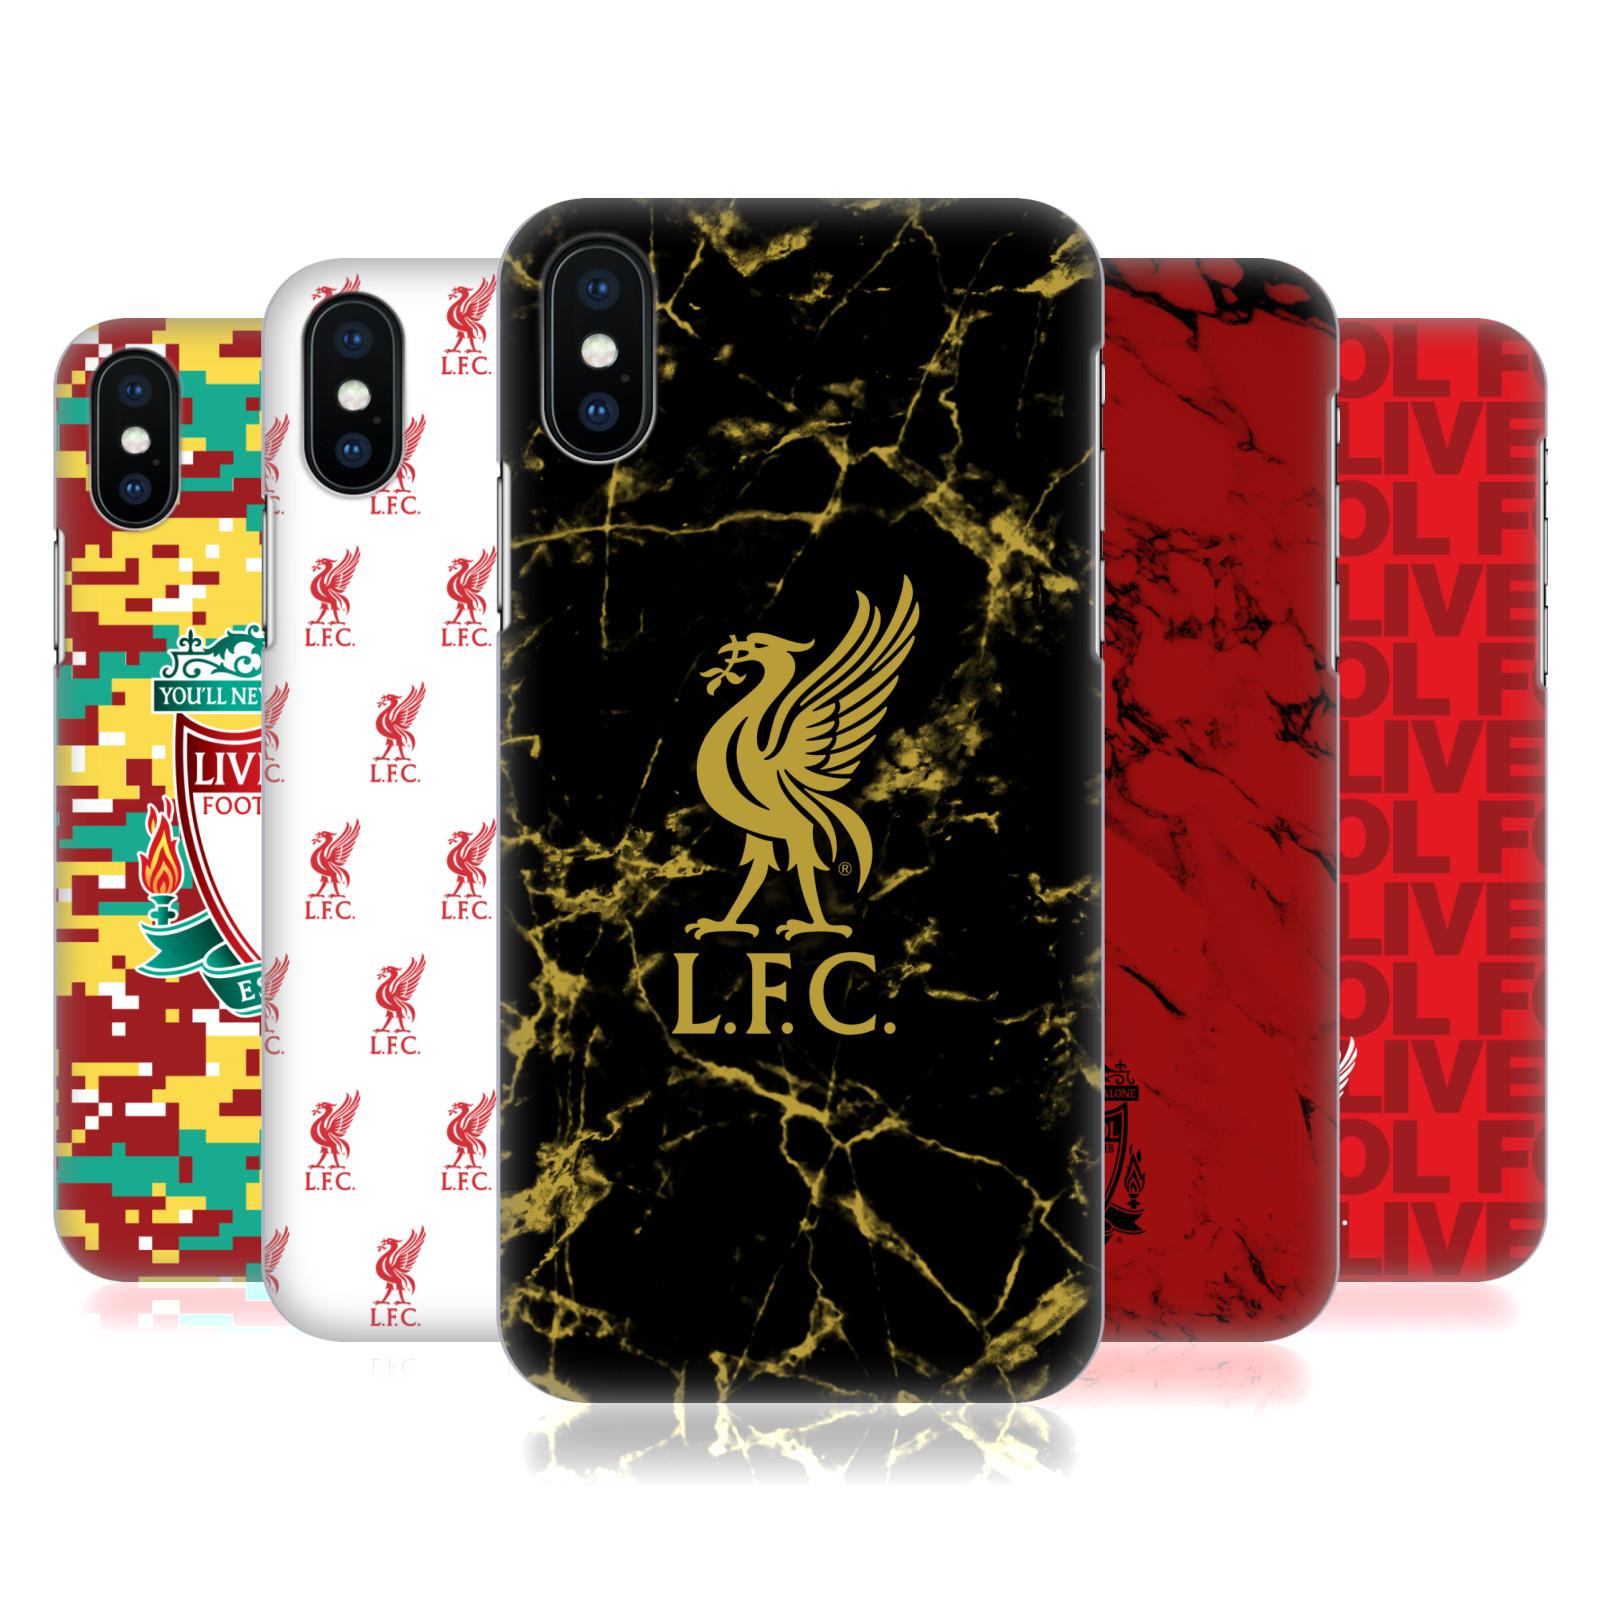 Liverpool Football Club 2018/19 Crest & Liverbird Patterns